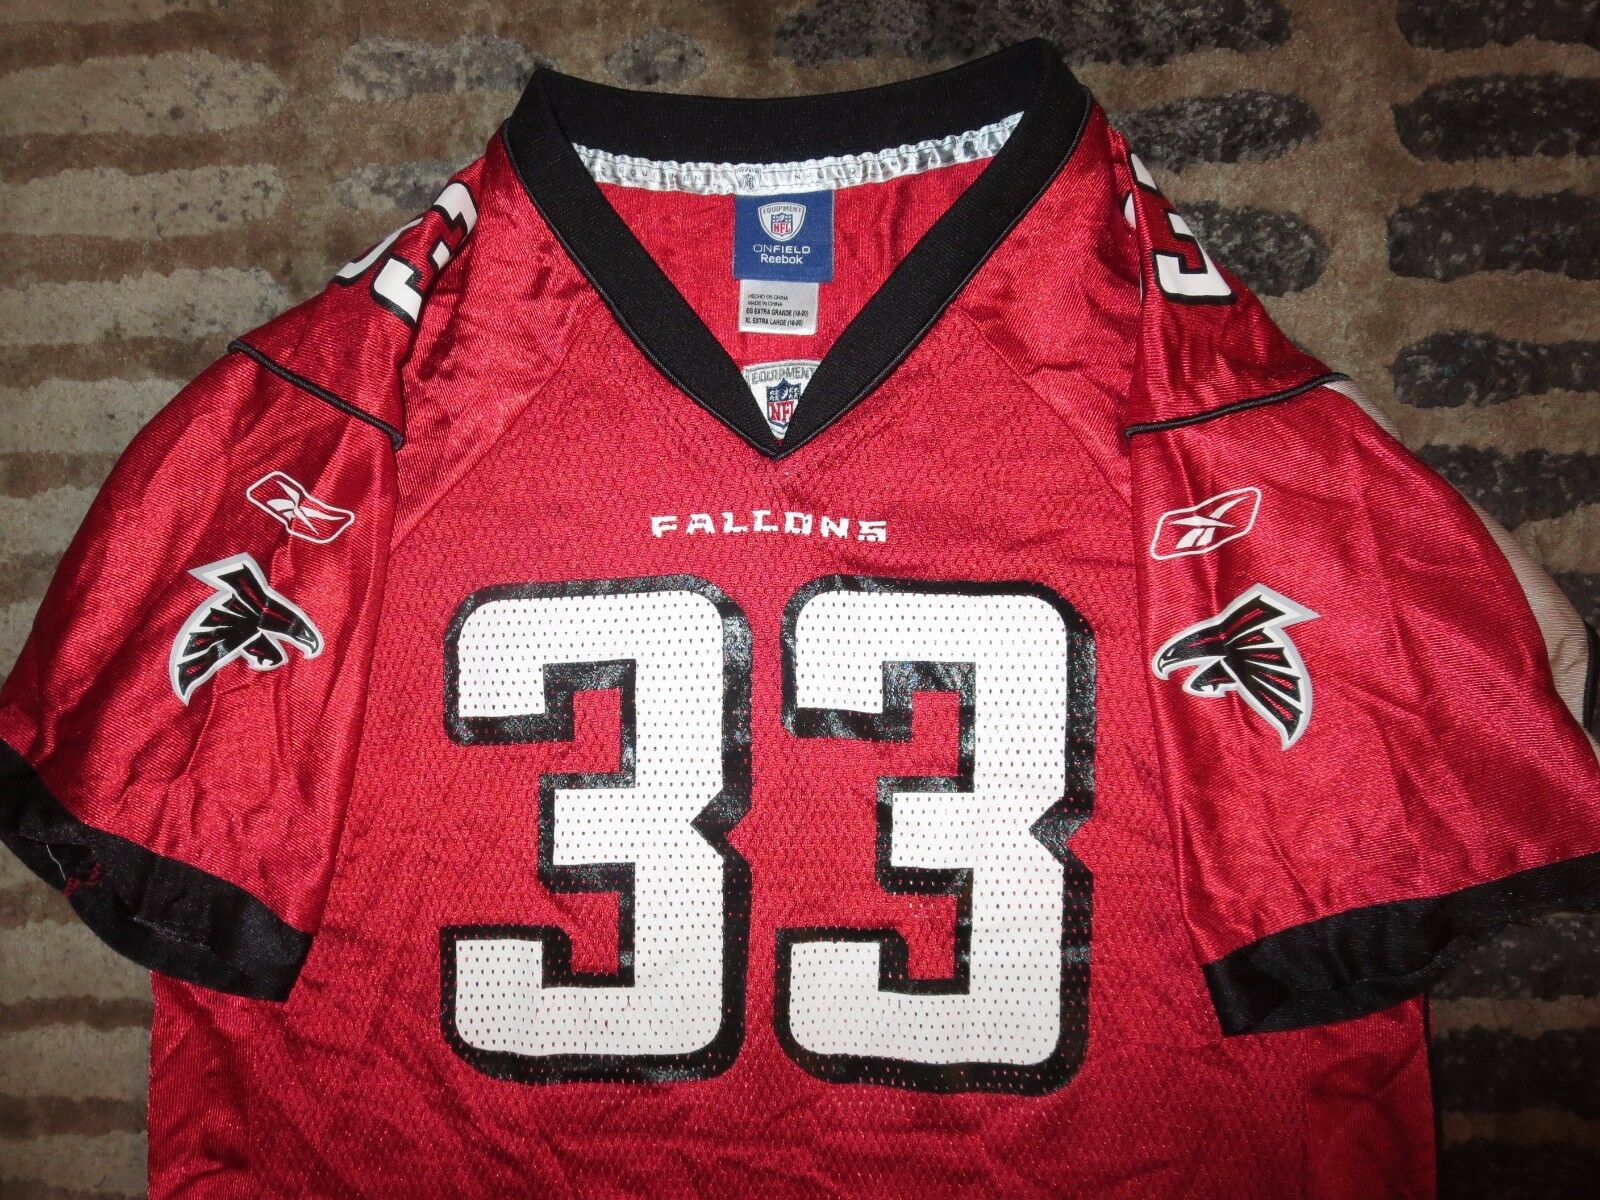 Atlanta Falcons  33 Turner Reebok Rot Ausgabe NFL Trikot Trikot Trikot Jugendliche 486e43